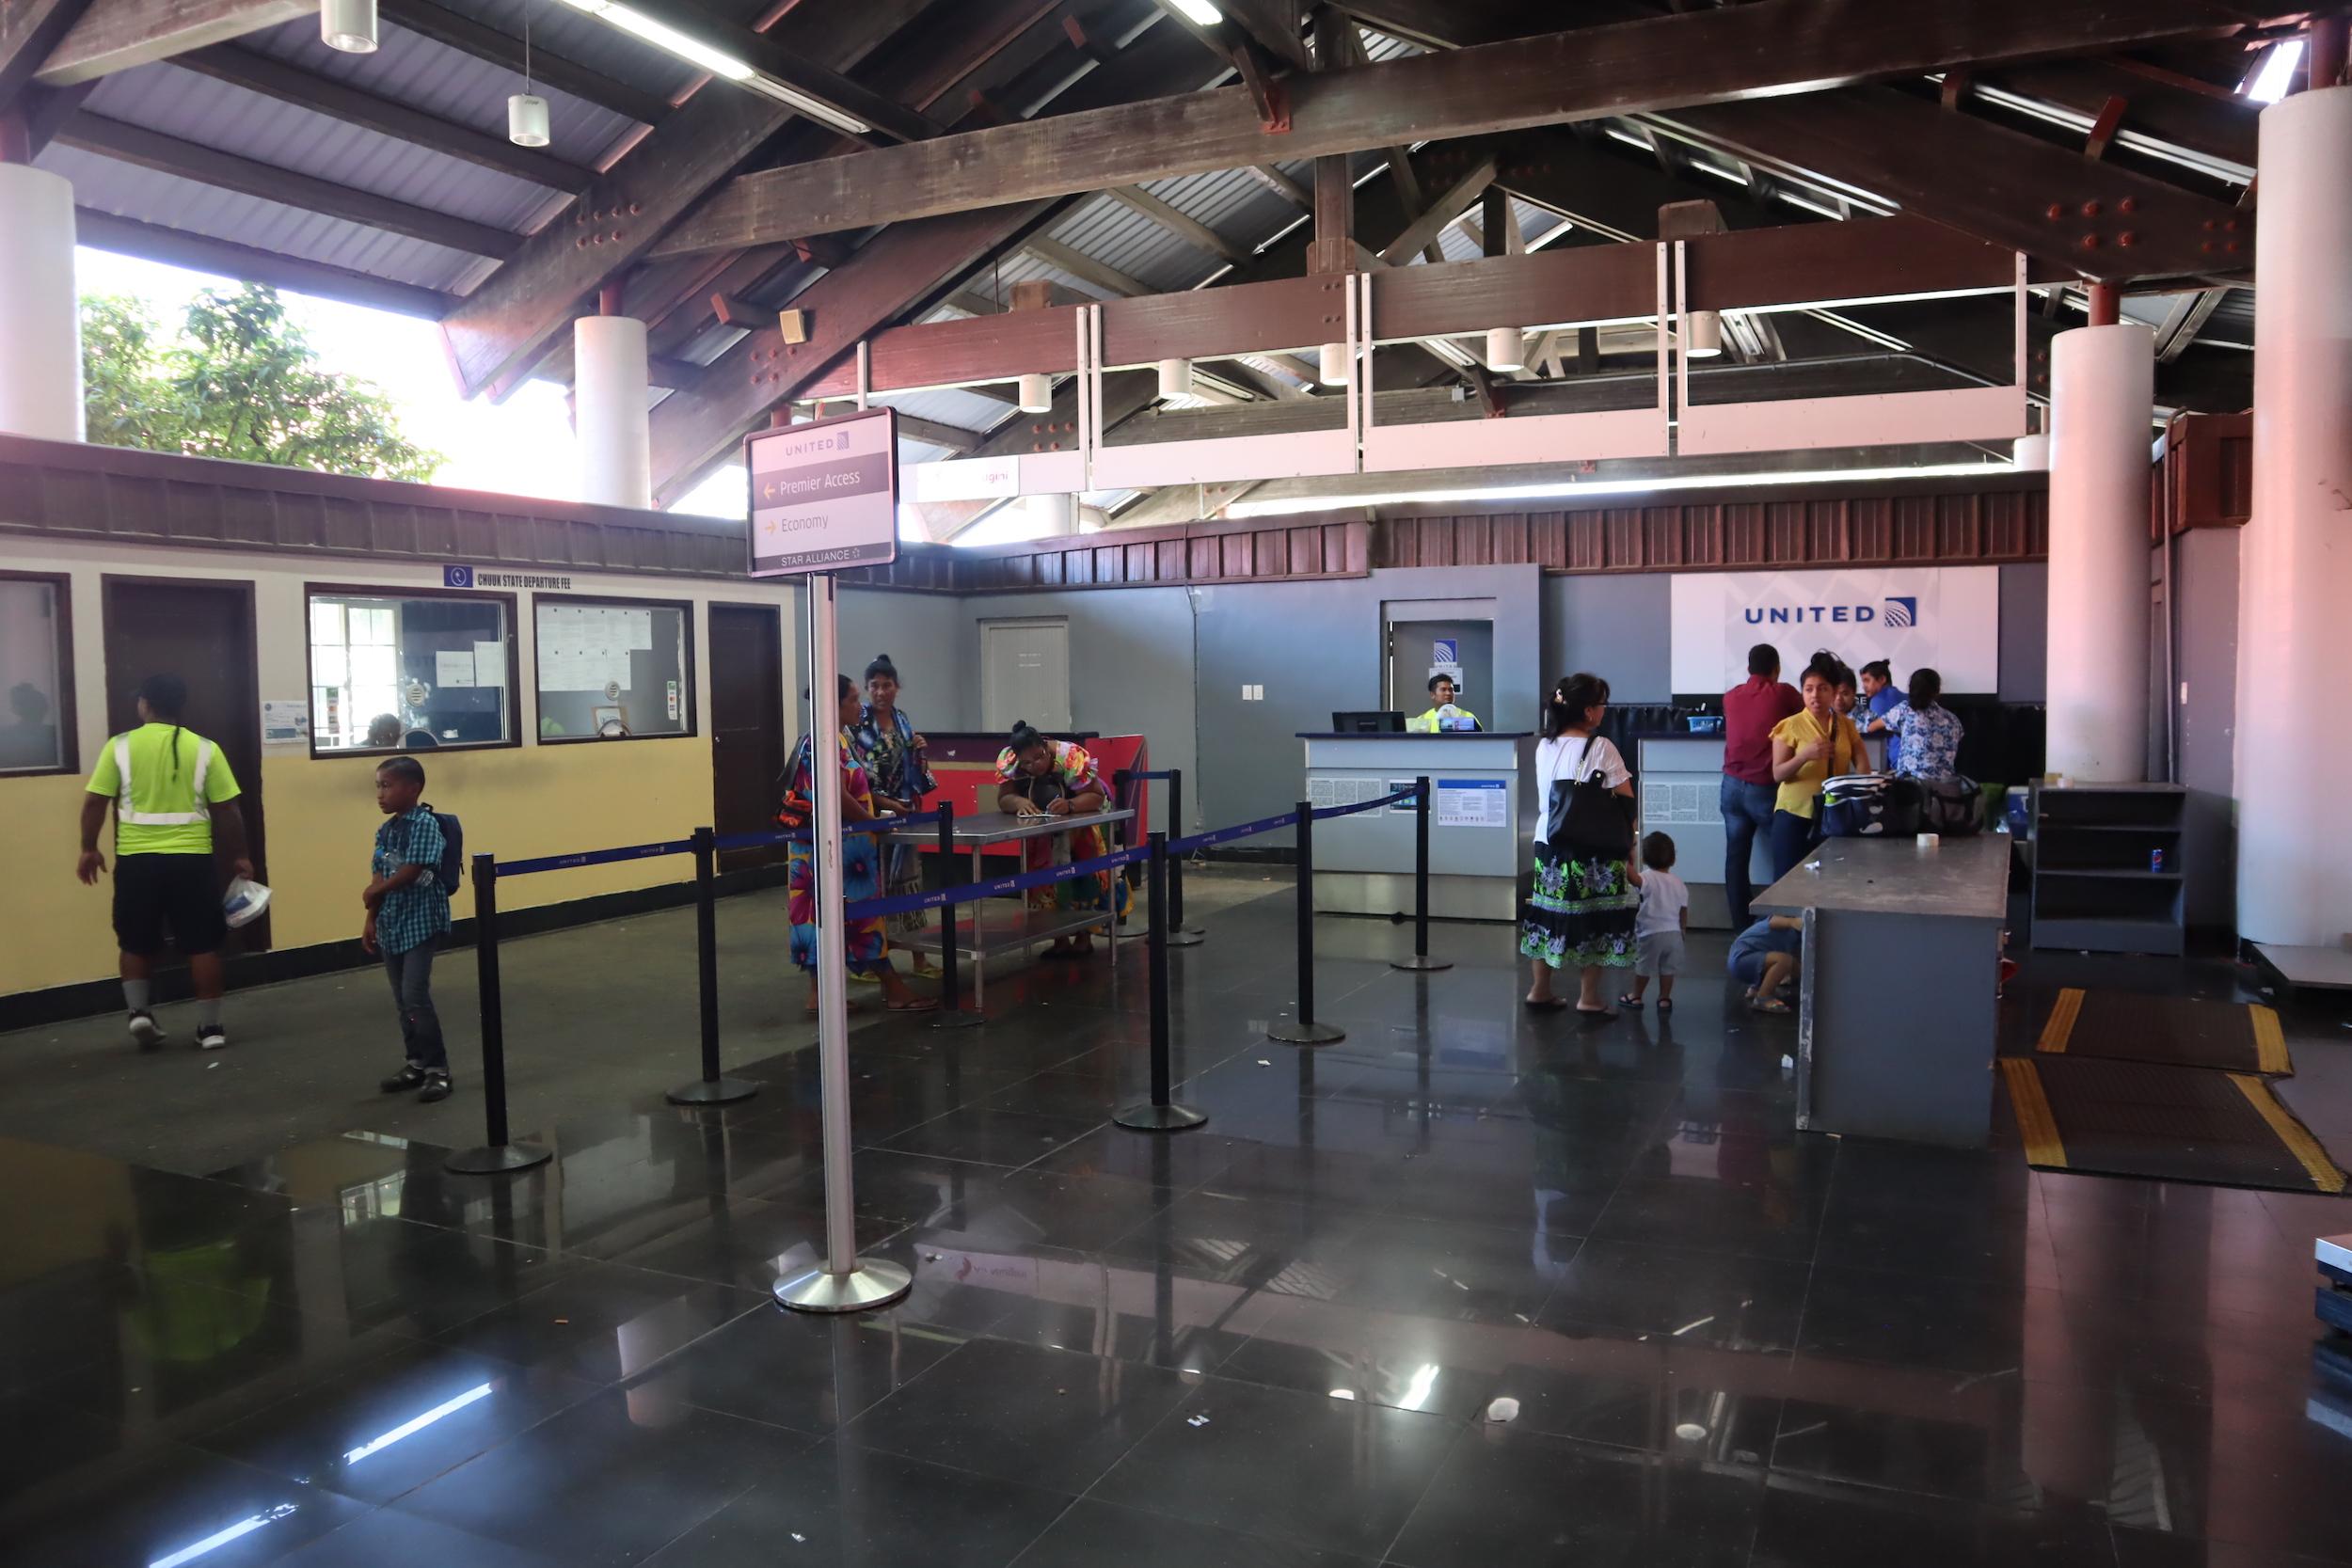 Chuuk International Airport – United check-in desk